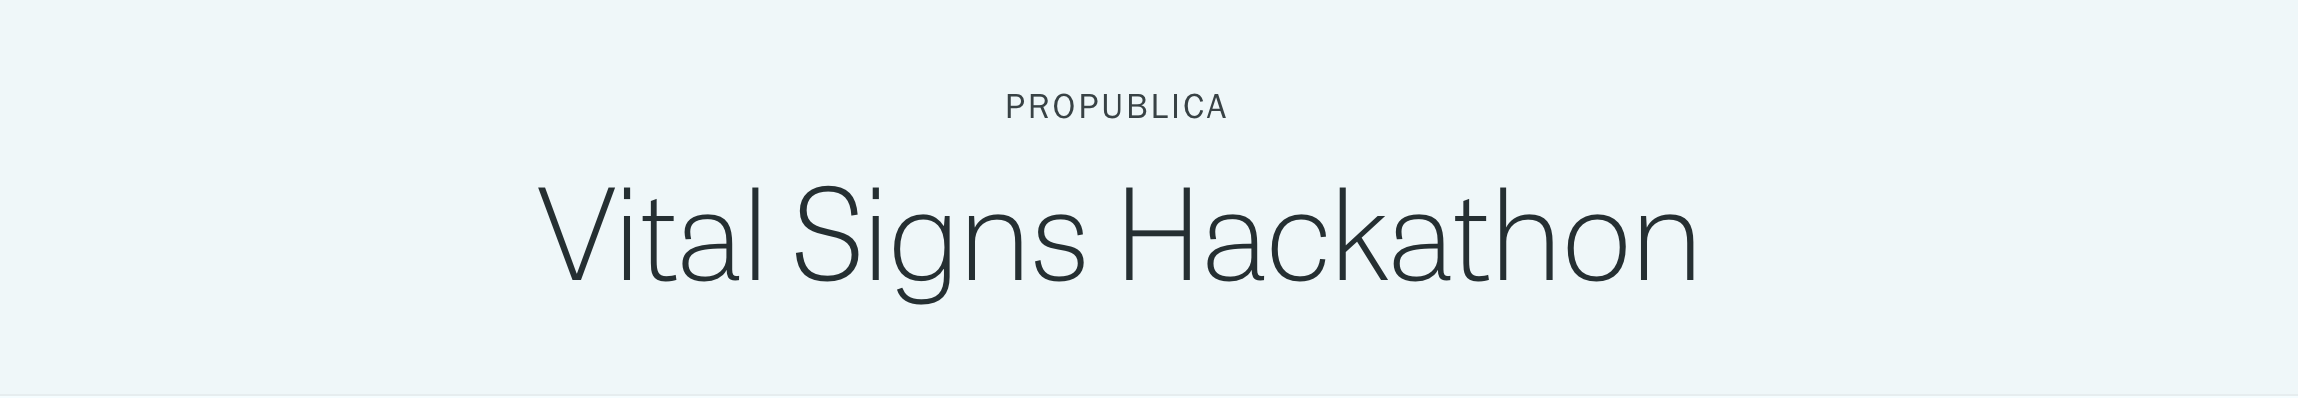 Vital Signs Hackathon